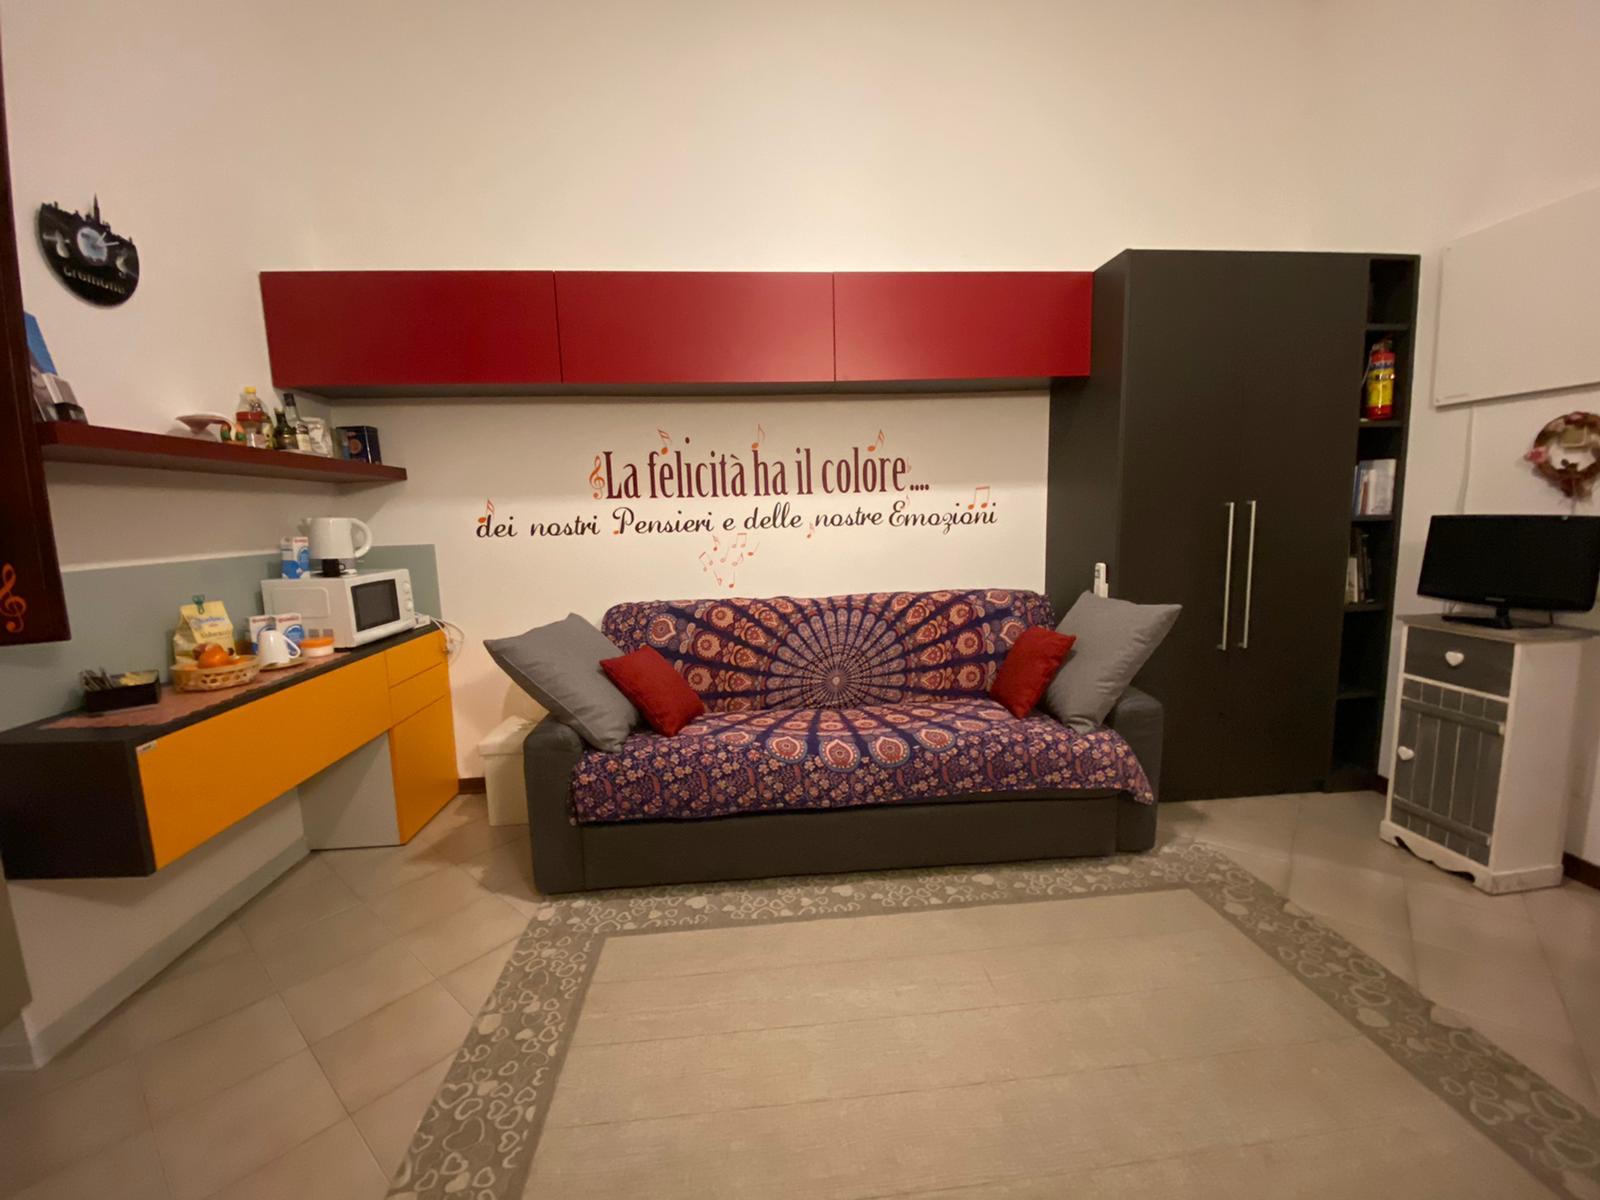 https://www.in-lombardia.it/sites/default/files/accomodation/images/107356/44699/cosy-studio-cremona_4.jpg